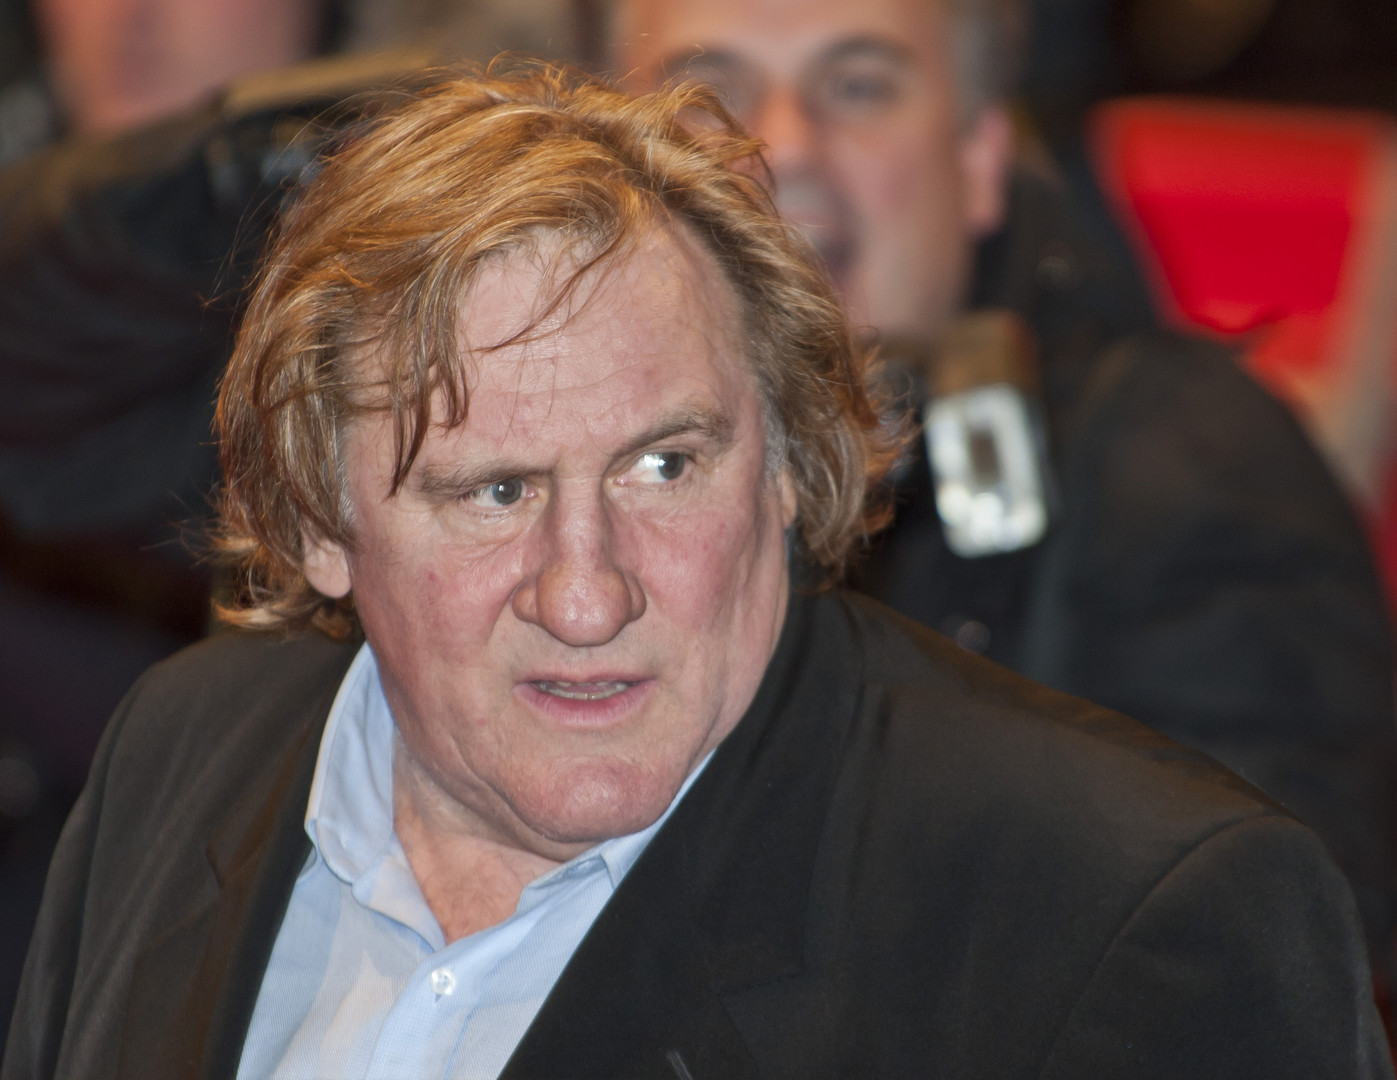 Gérard Depardieu au Festival du Film de Berlin en 2010.